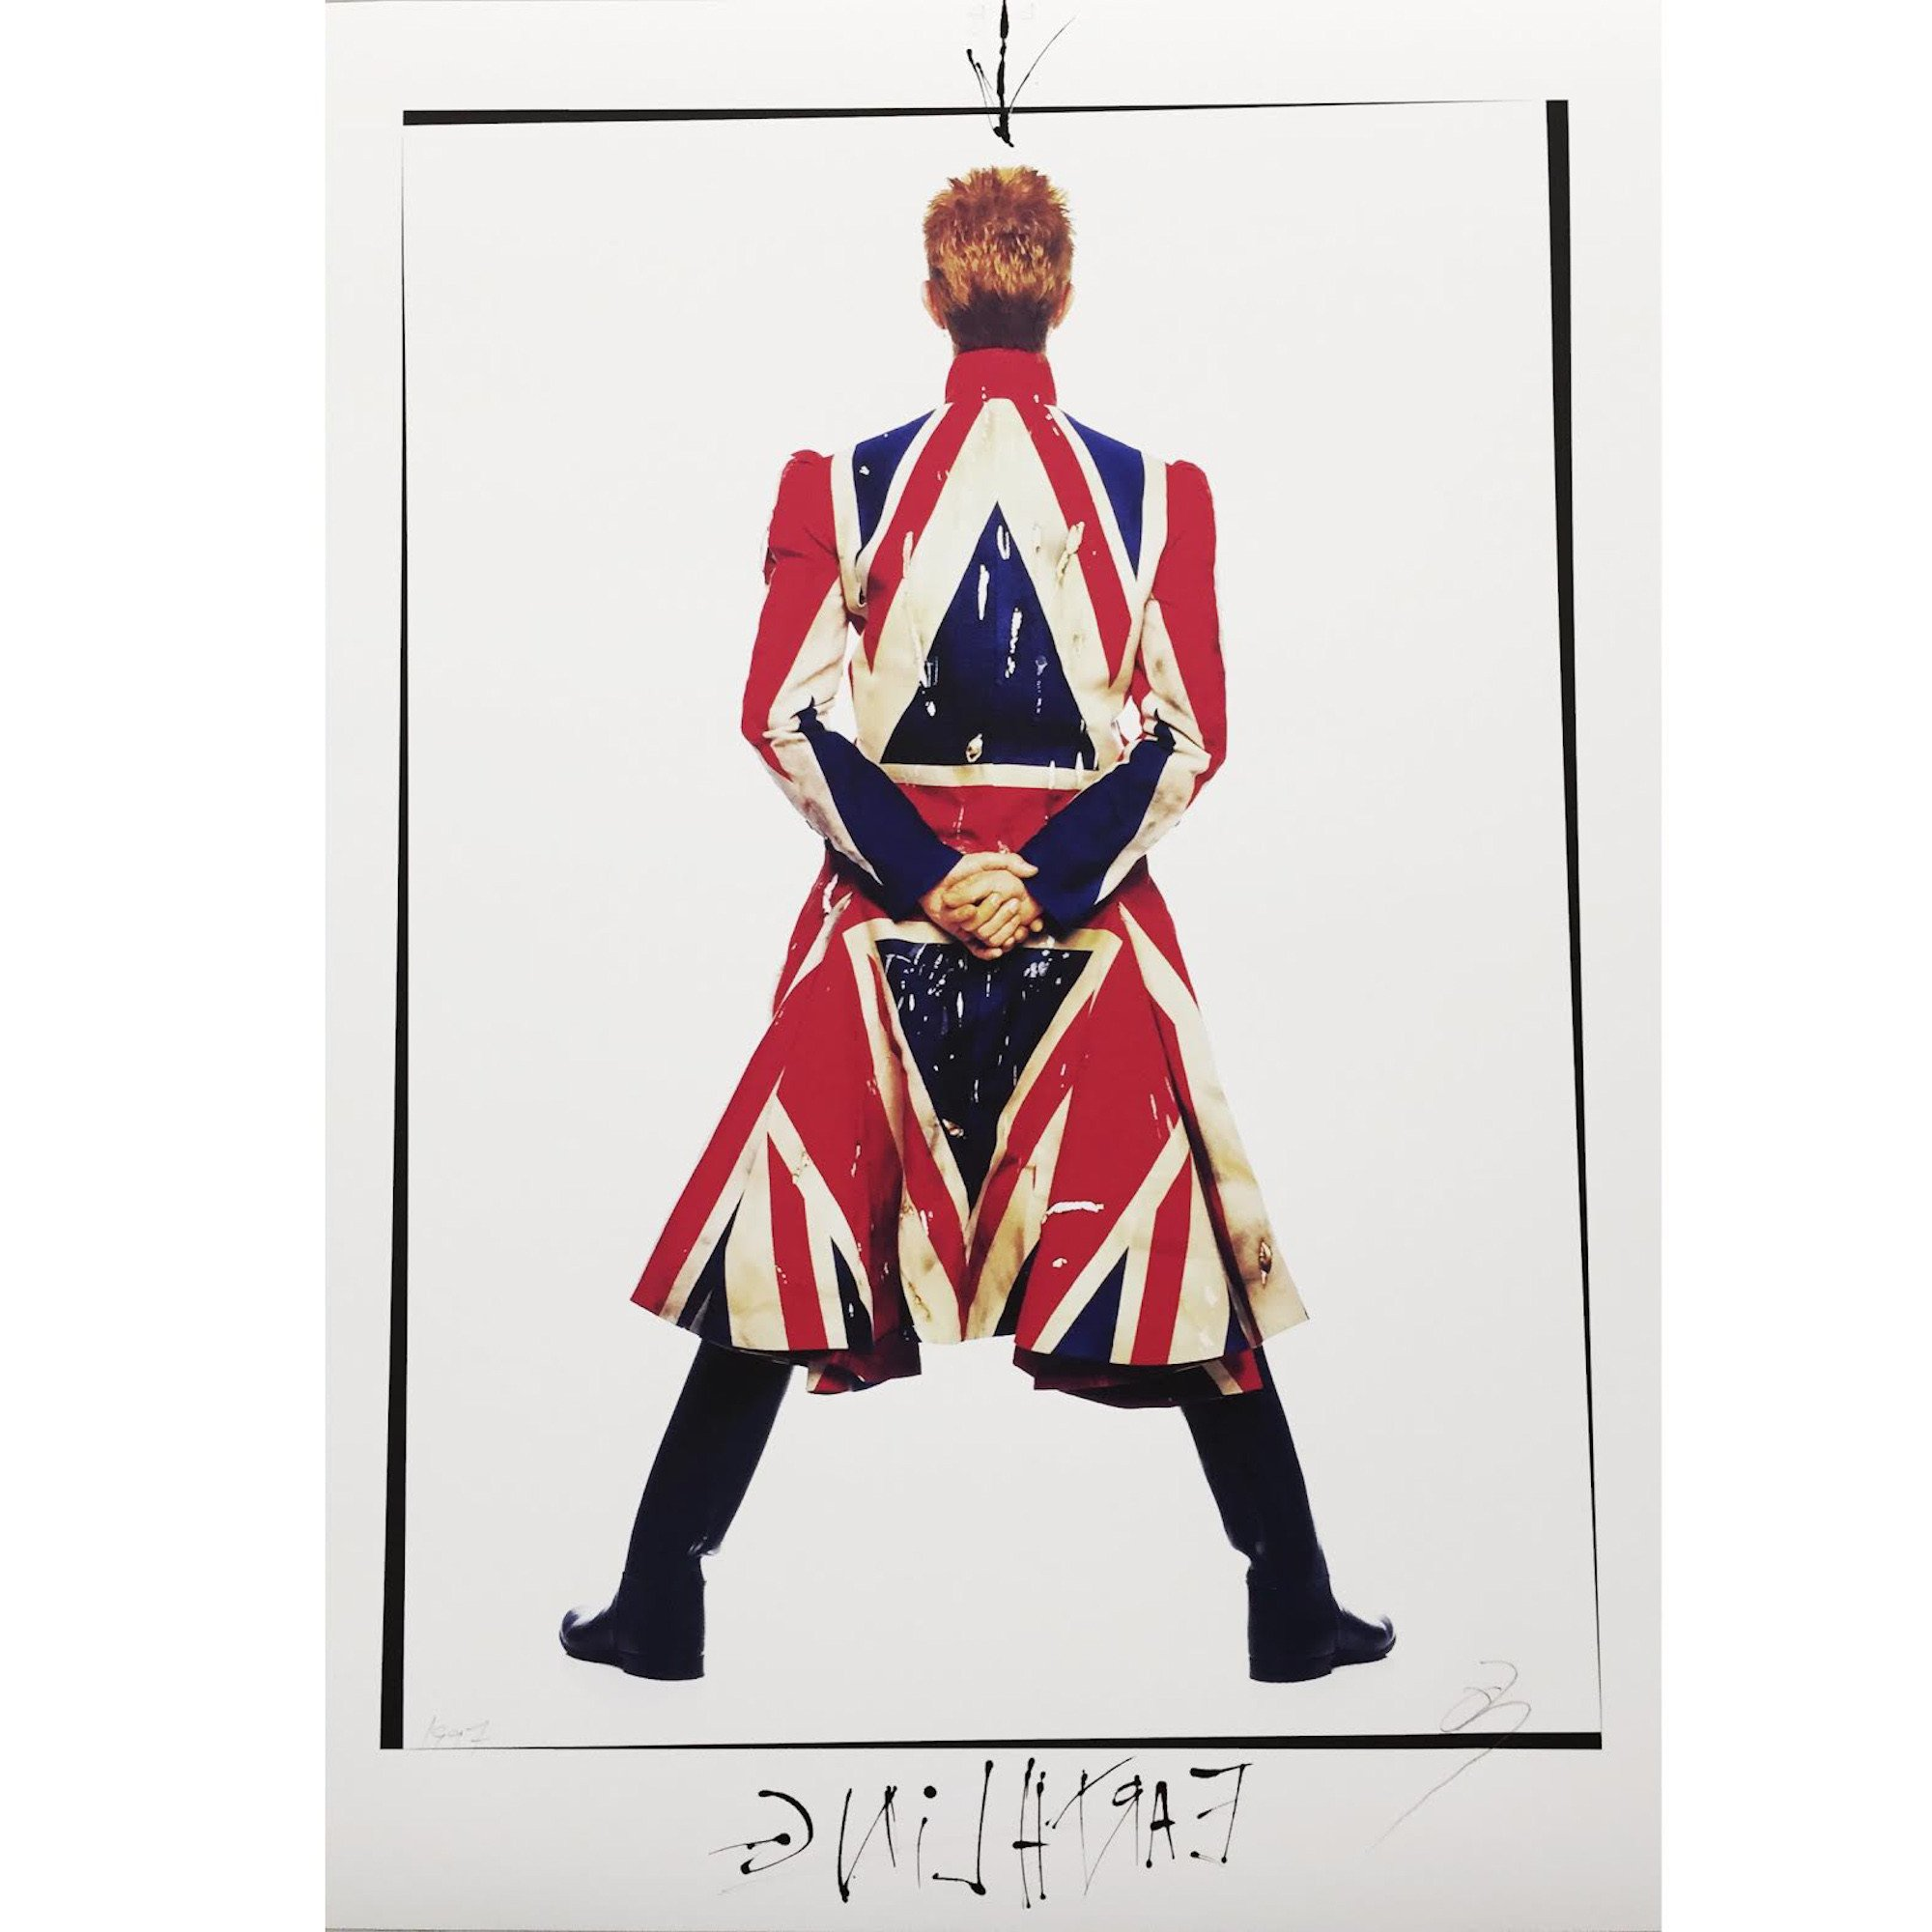 """Earthling"" David Bowie by Frank Ockenfels 3 who last showed at Zeitgeist in 2009"